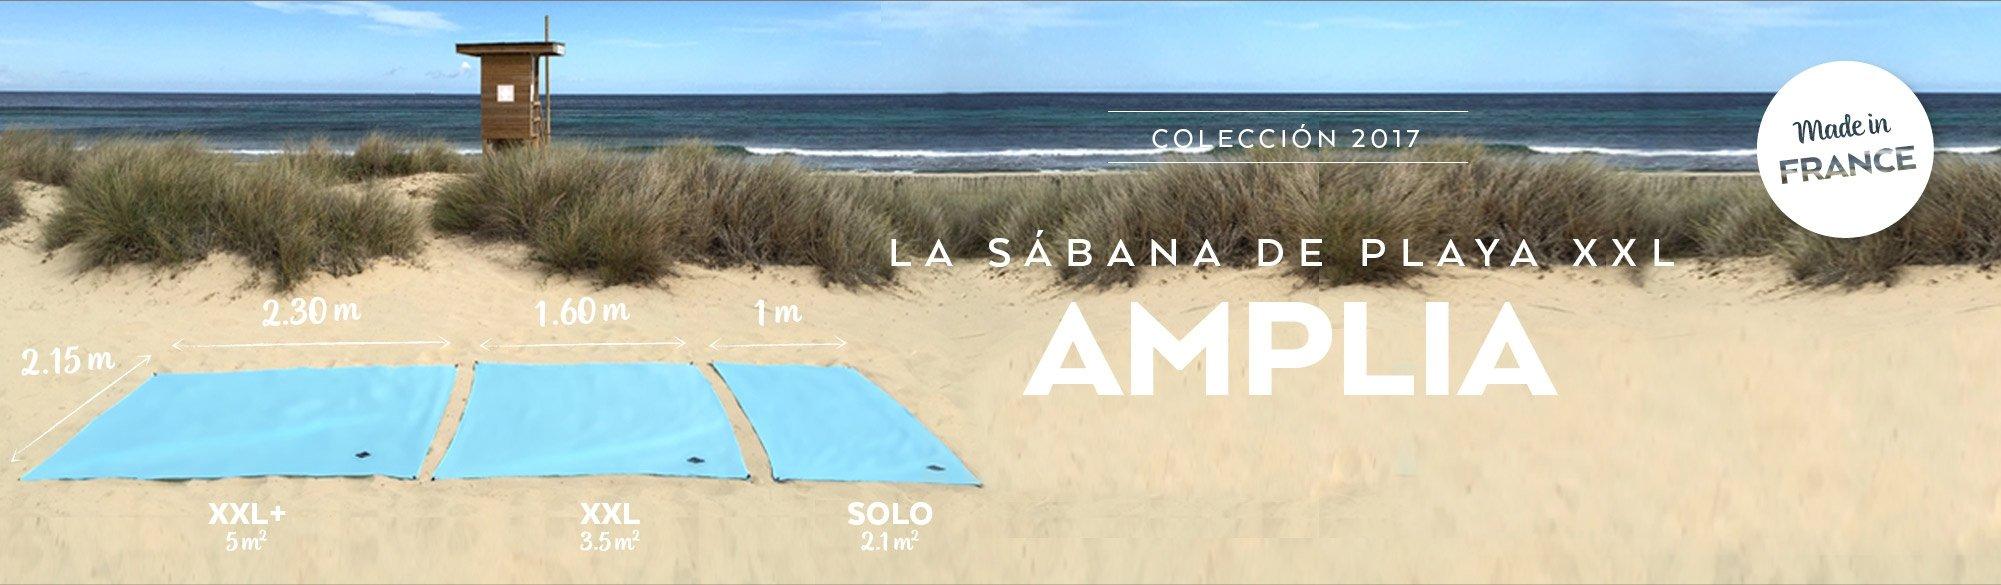 La sabana de playa amplia